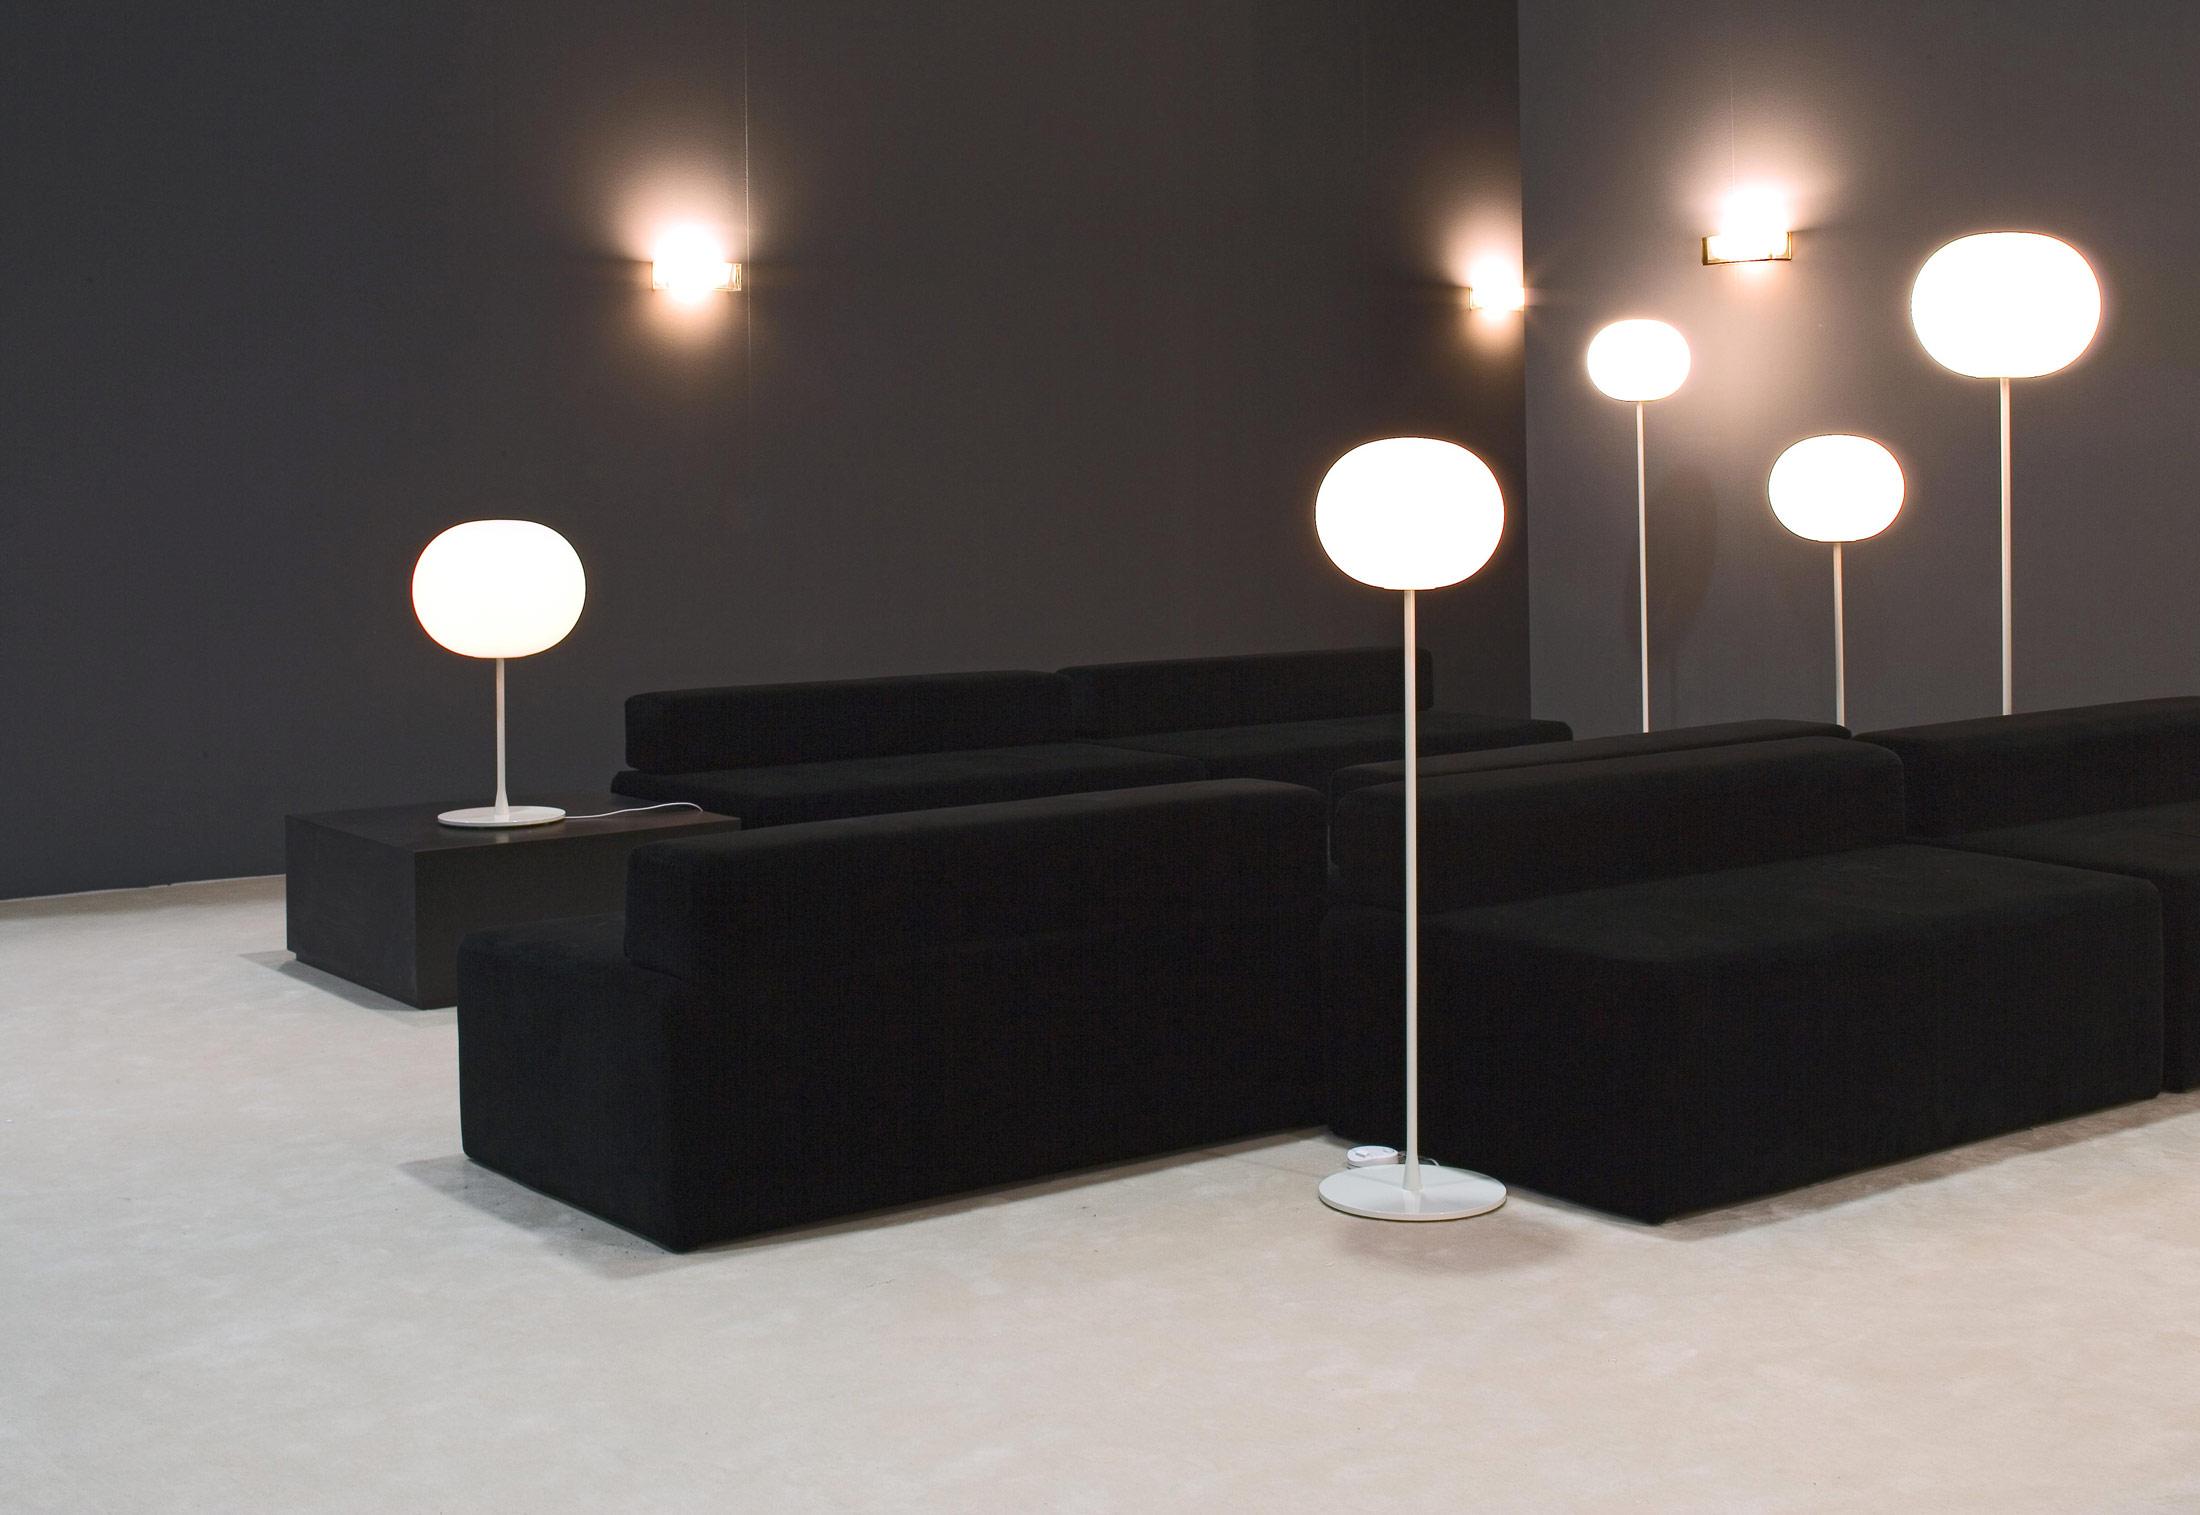 glo-ball-f2-floor-lamp-3 Elegantes Flos Glo Ball S Dekorationen